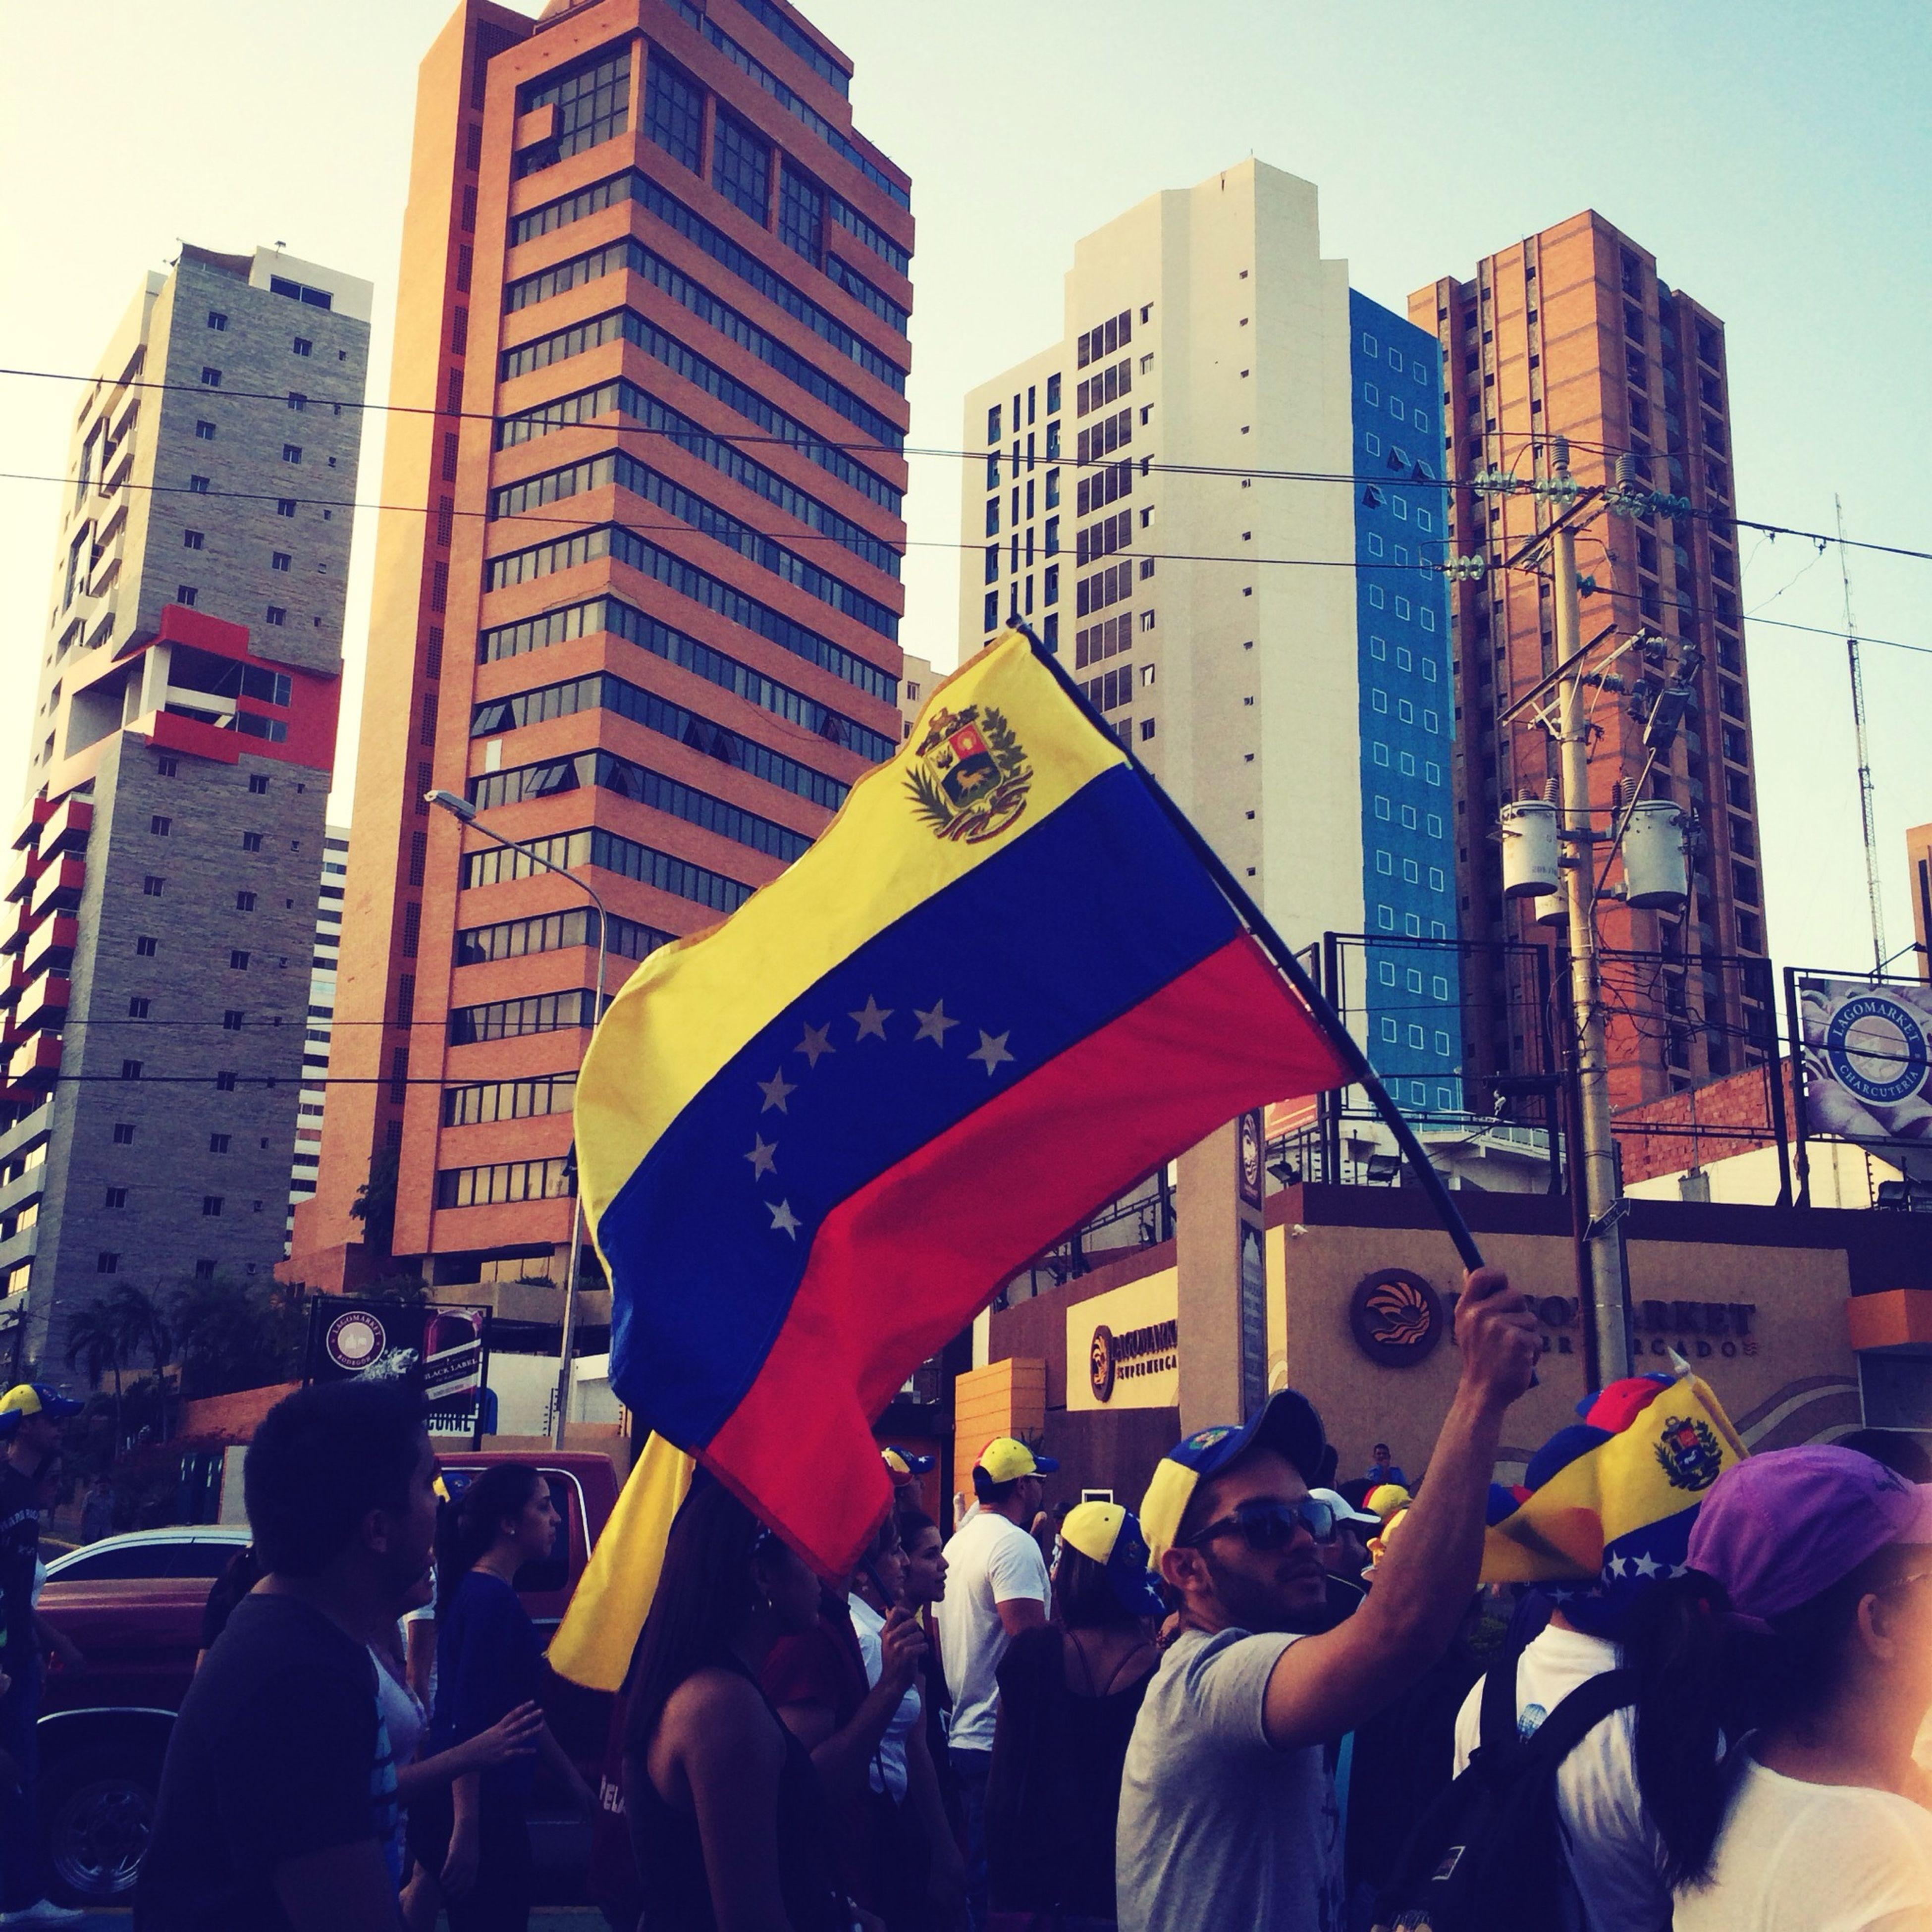 Los Colores Que Nos Mueven Venezuela Maracaibo Prayforvenezuela Adapted To The City Adapted To The City